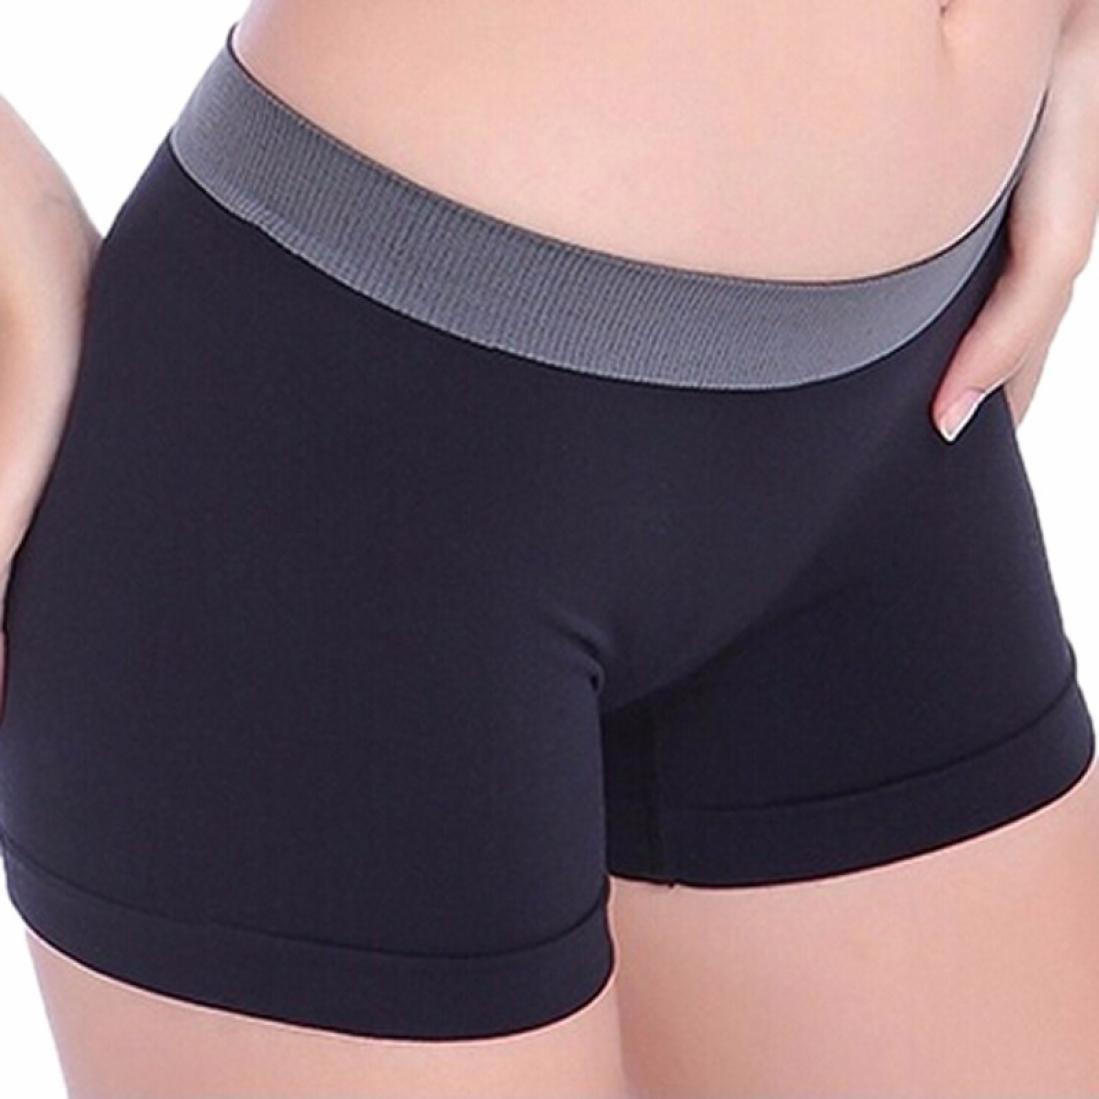 Yoga Pants TOOPOOT Summer Women Sports Gym Workout Shorts-black